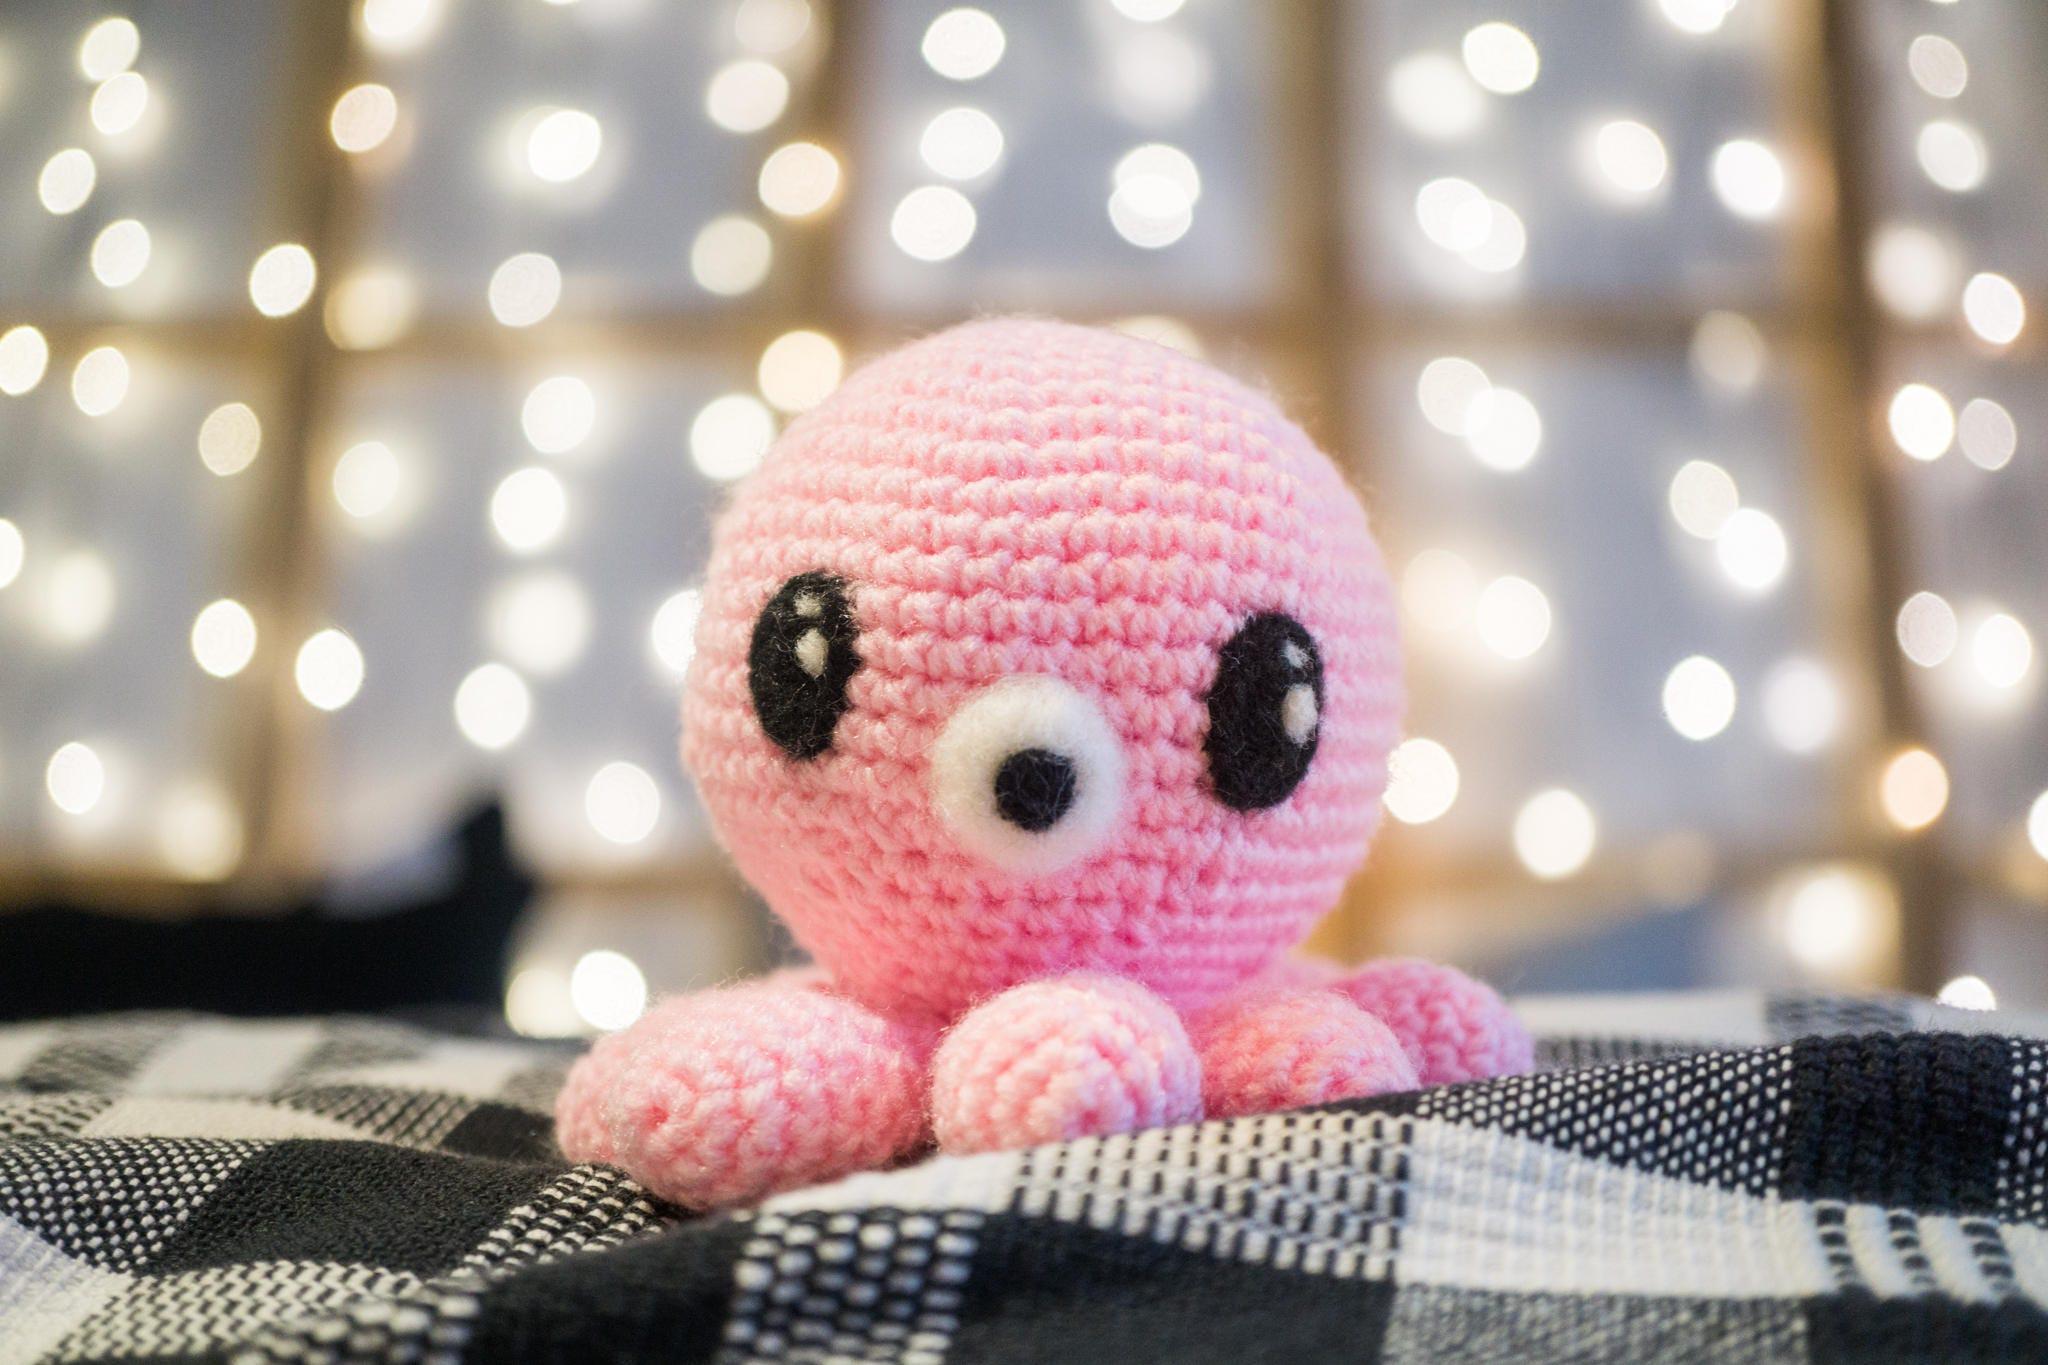 Citaten Zoon The Legend Of The Blue Sea : Pink octopus amigurumi plush doll diy kdrama crochet